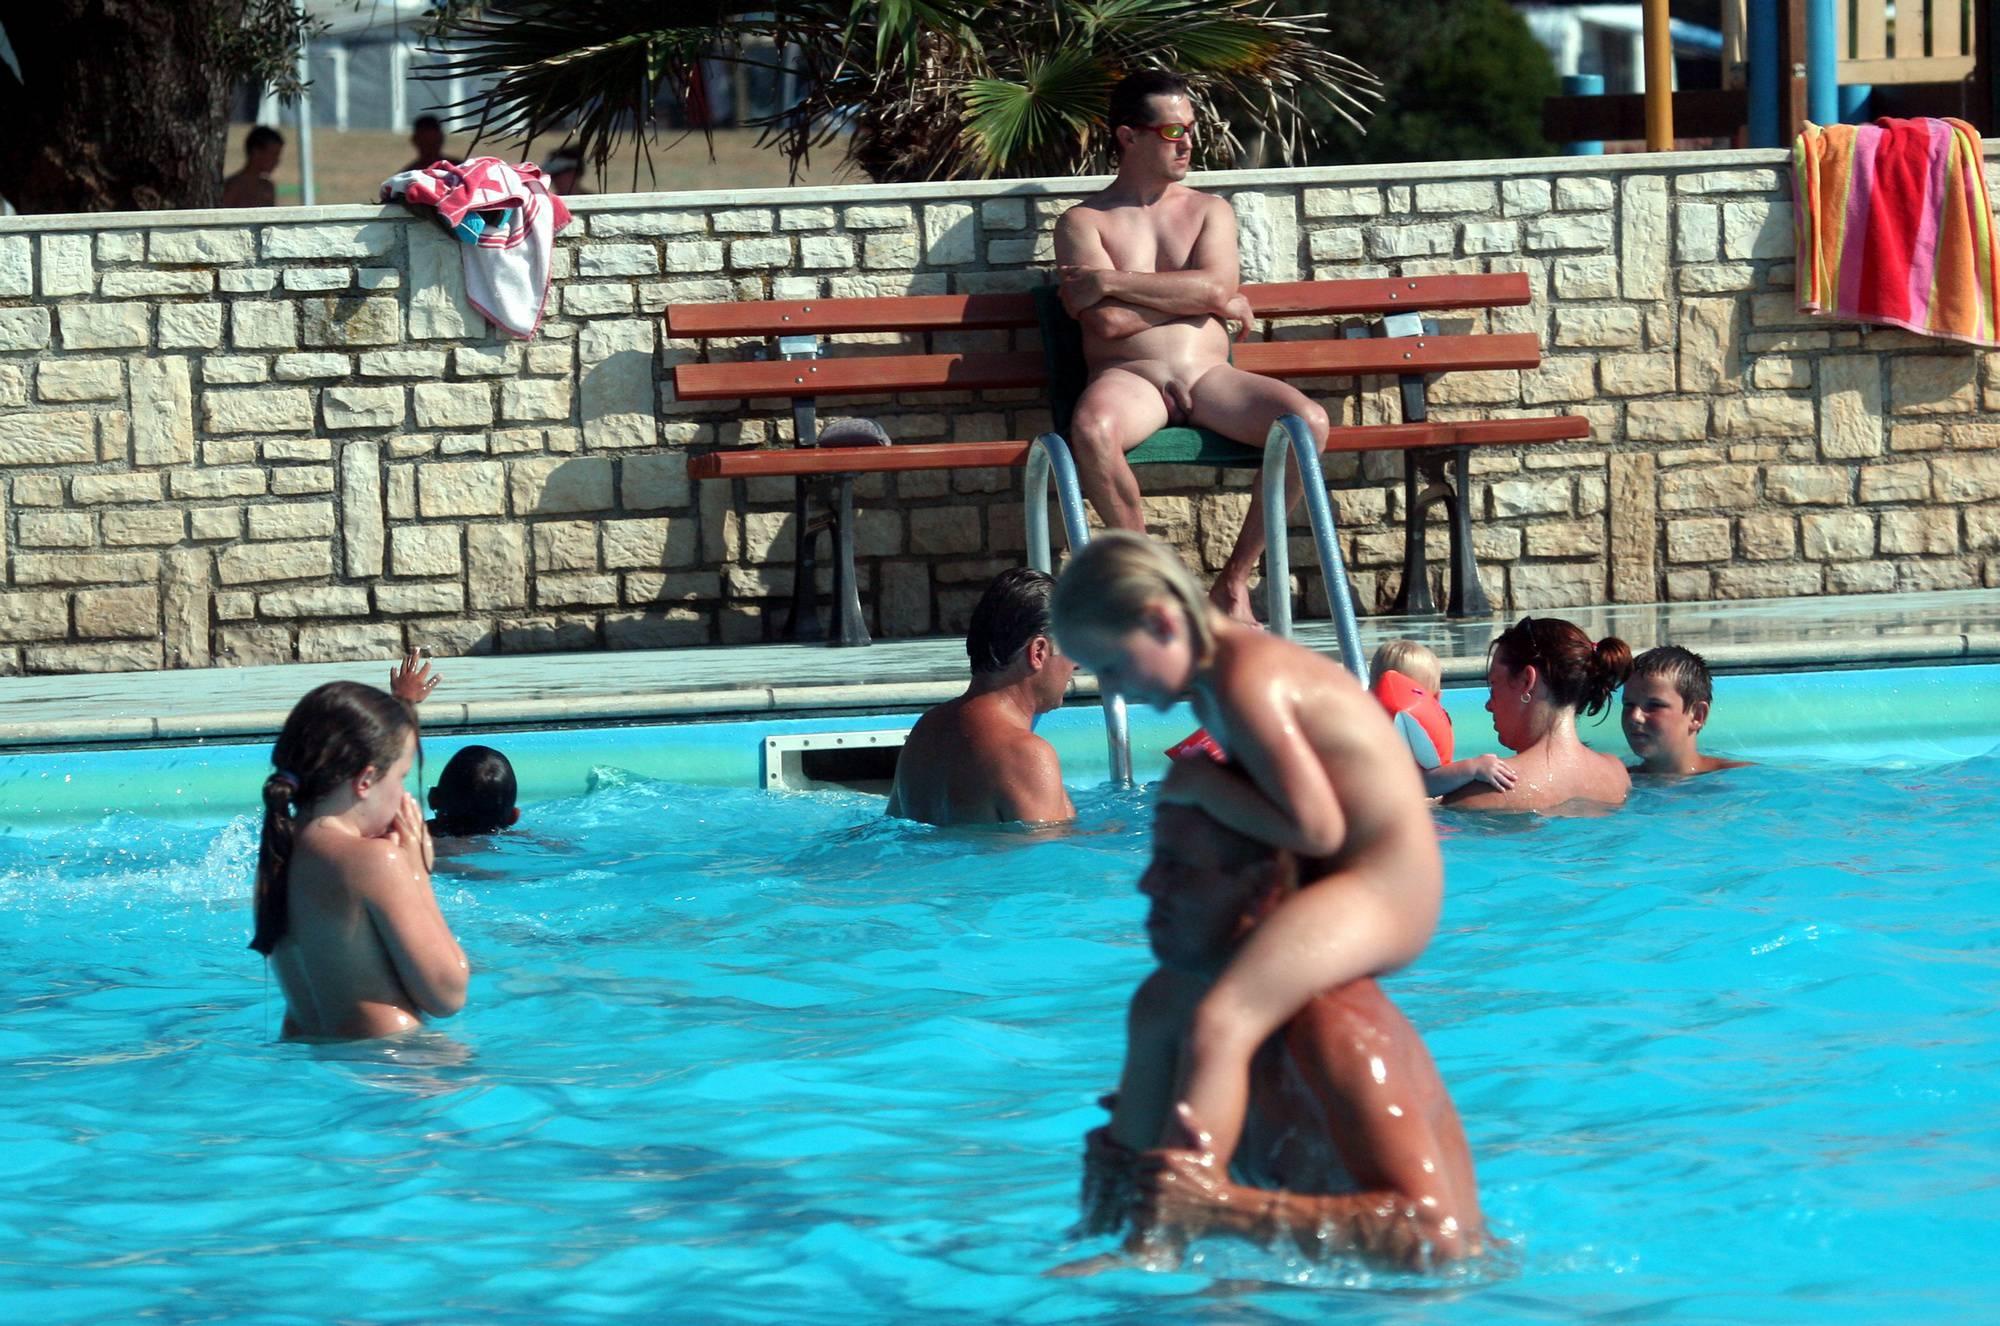 Purenudism Pics Nudist Pool In-Water Shots - 3